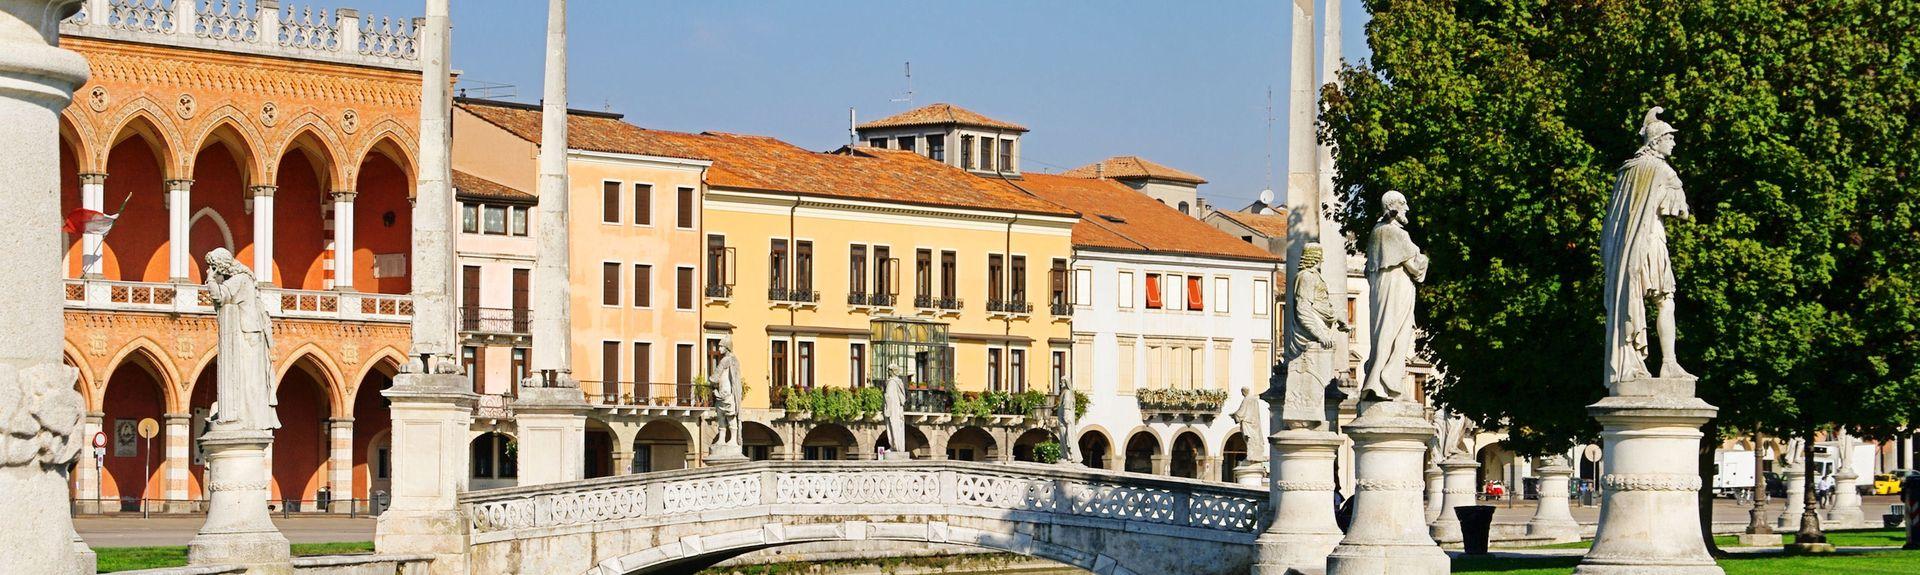 Province of Padua, Italy